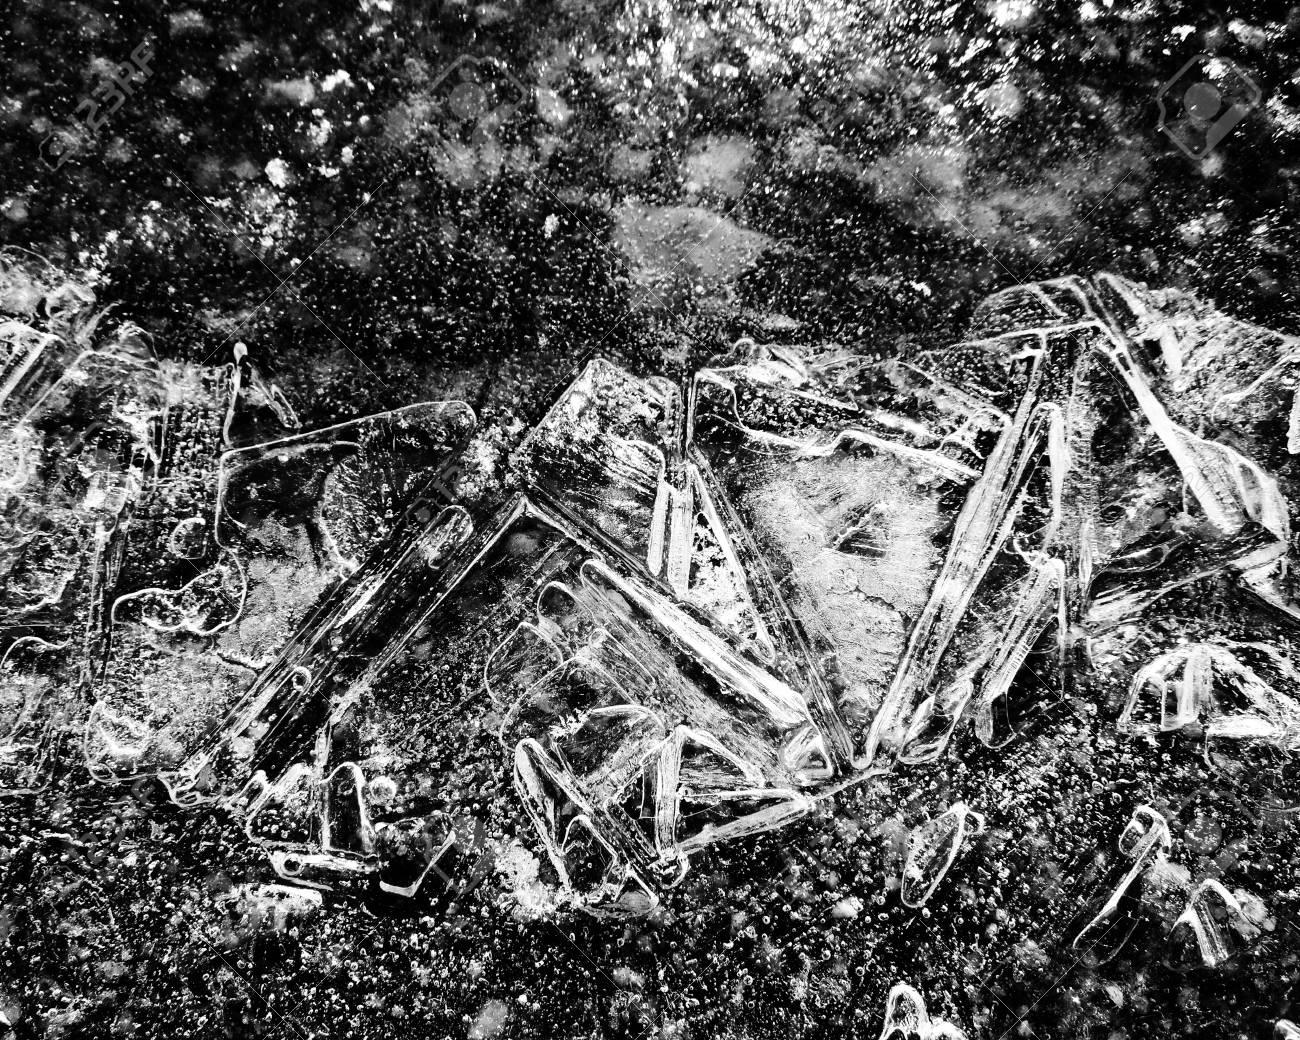 Ice Crystals Winter Background Monochrome Stock Photo - 50797435